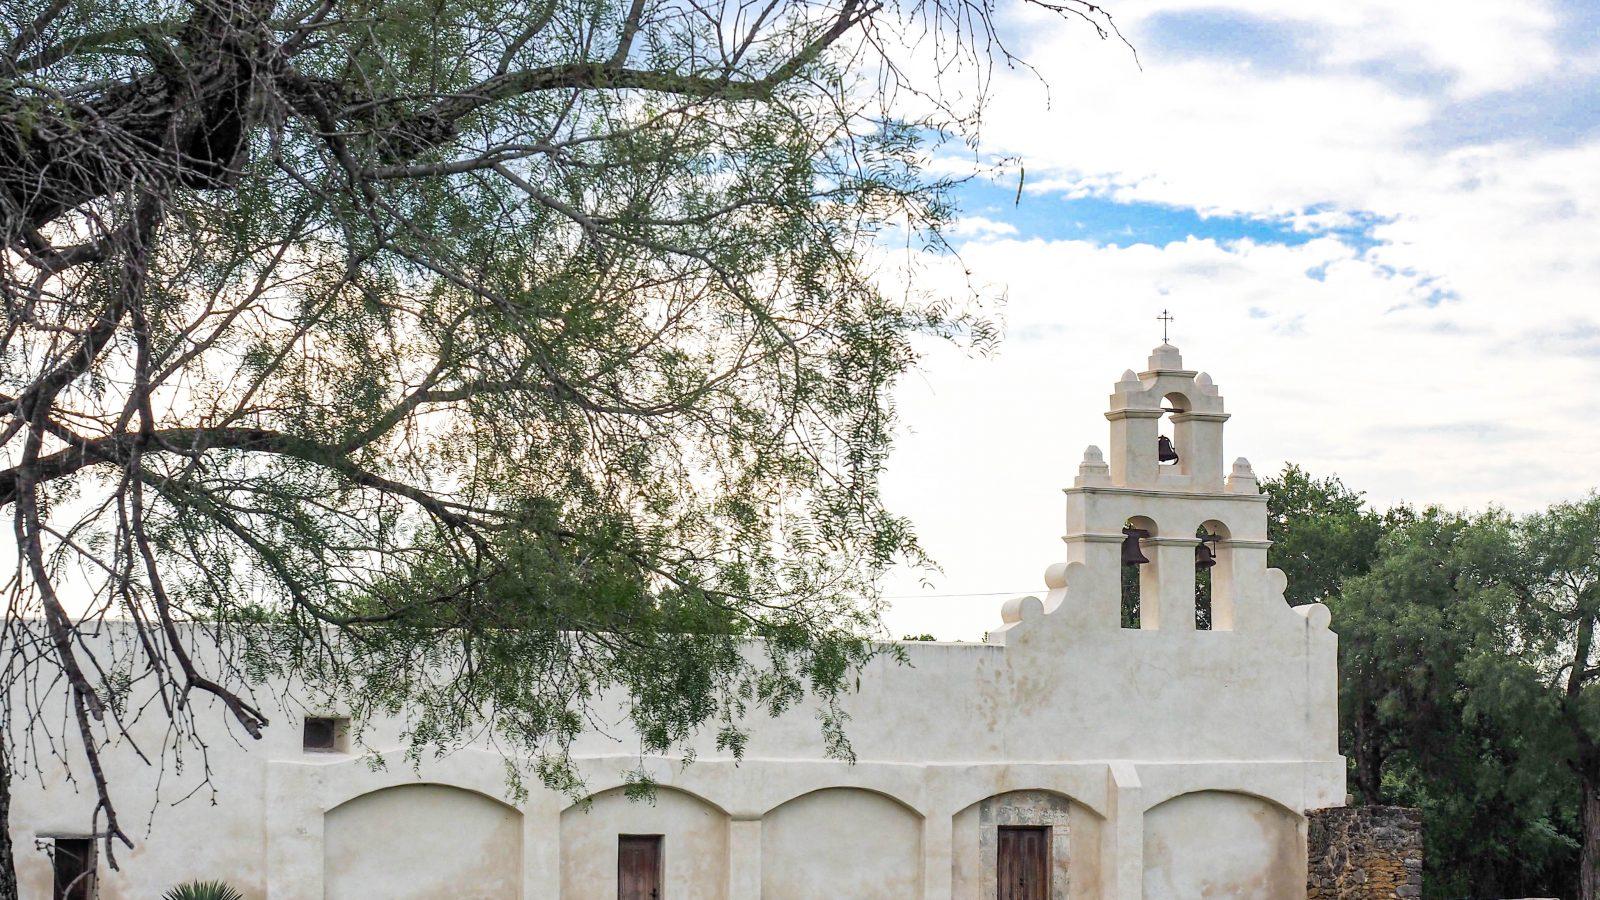 Historical sites in San Antonio, Texas | San Antonio Missions, historic hotels in san antonio, where to stay in san antonio